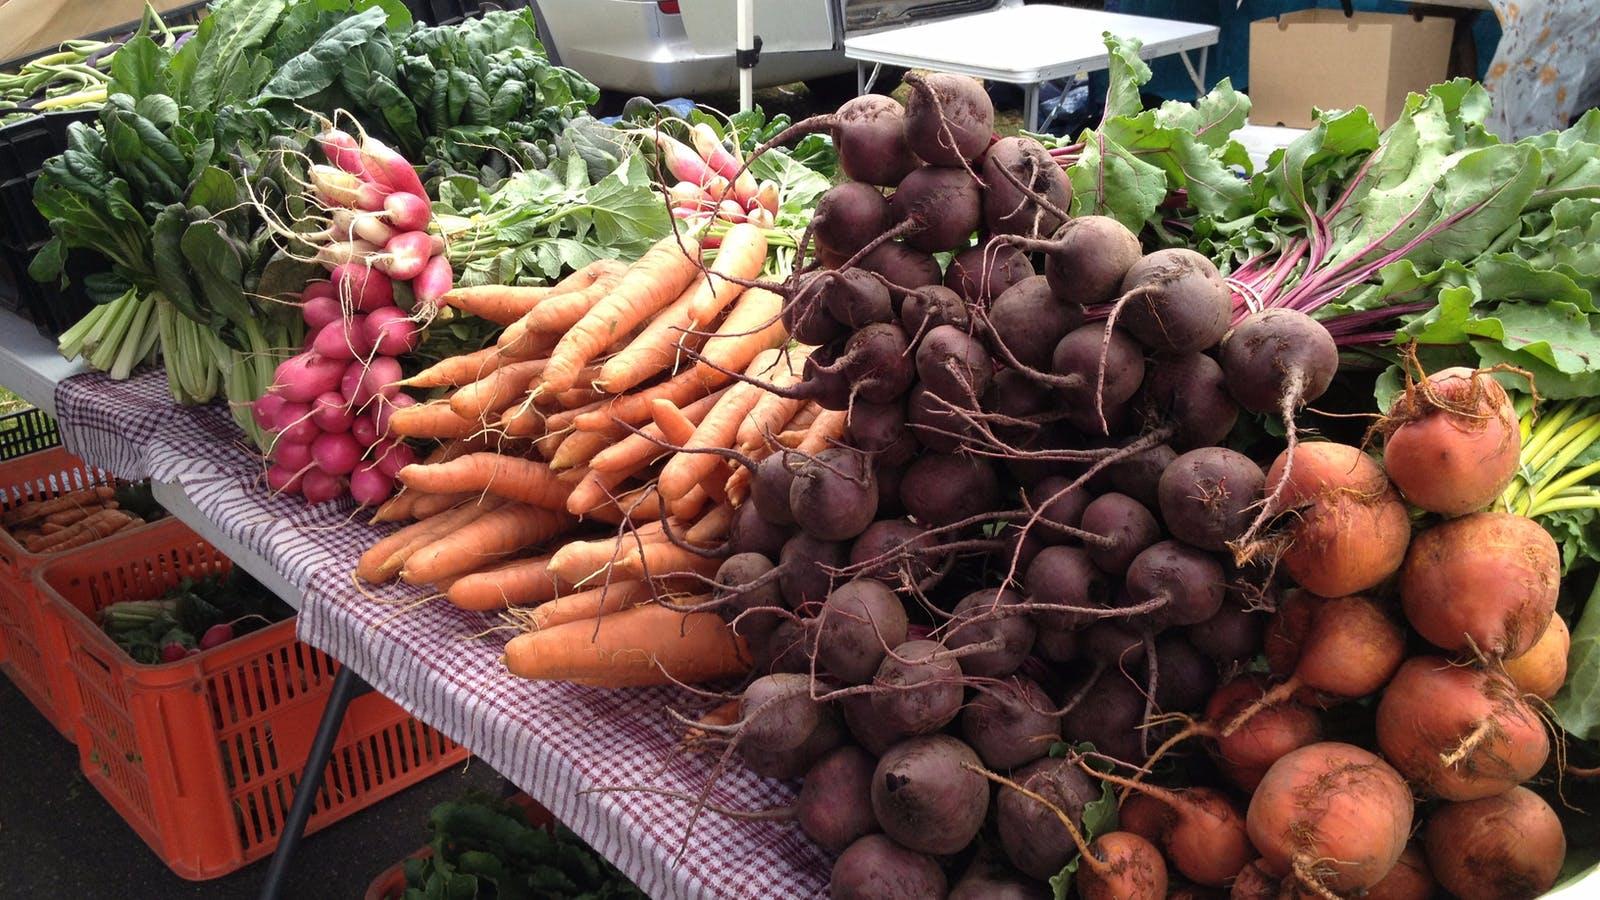 Fresh produce at Flemington Farmers market